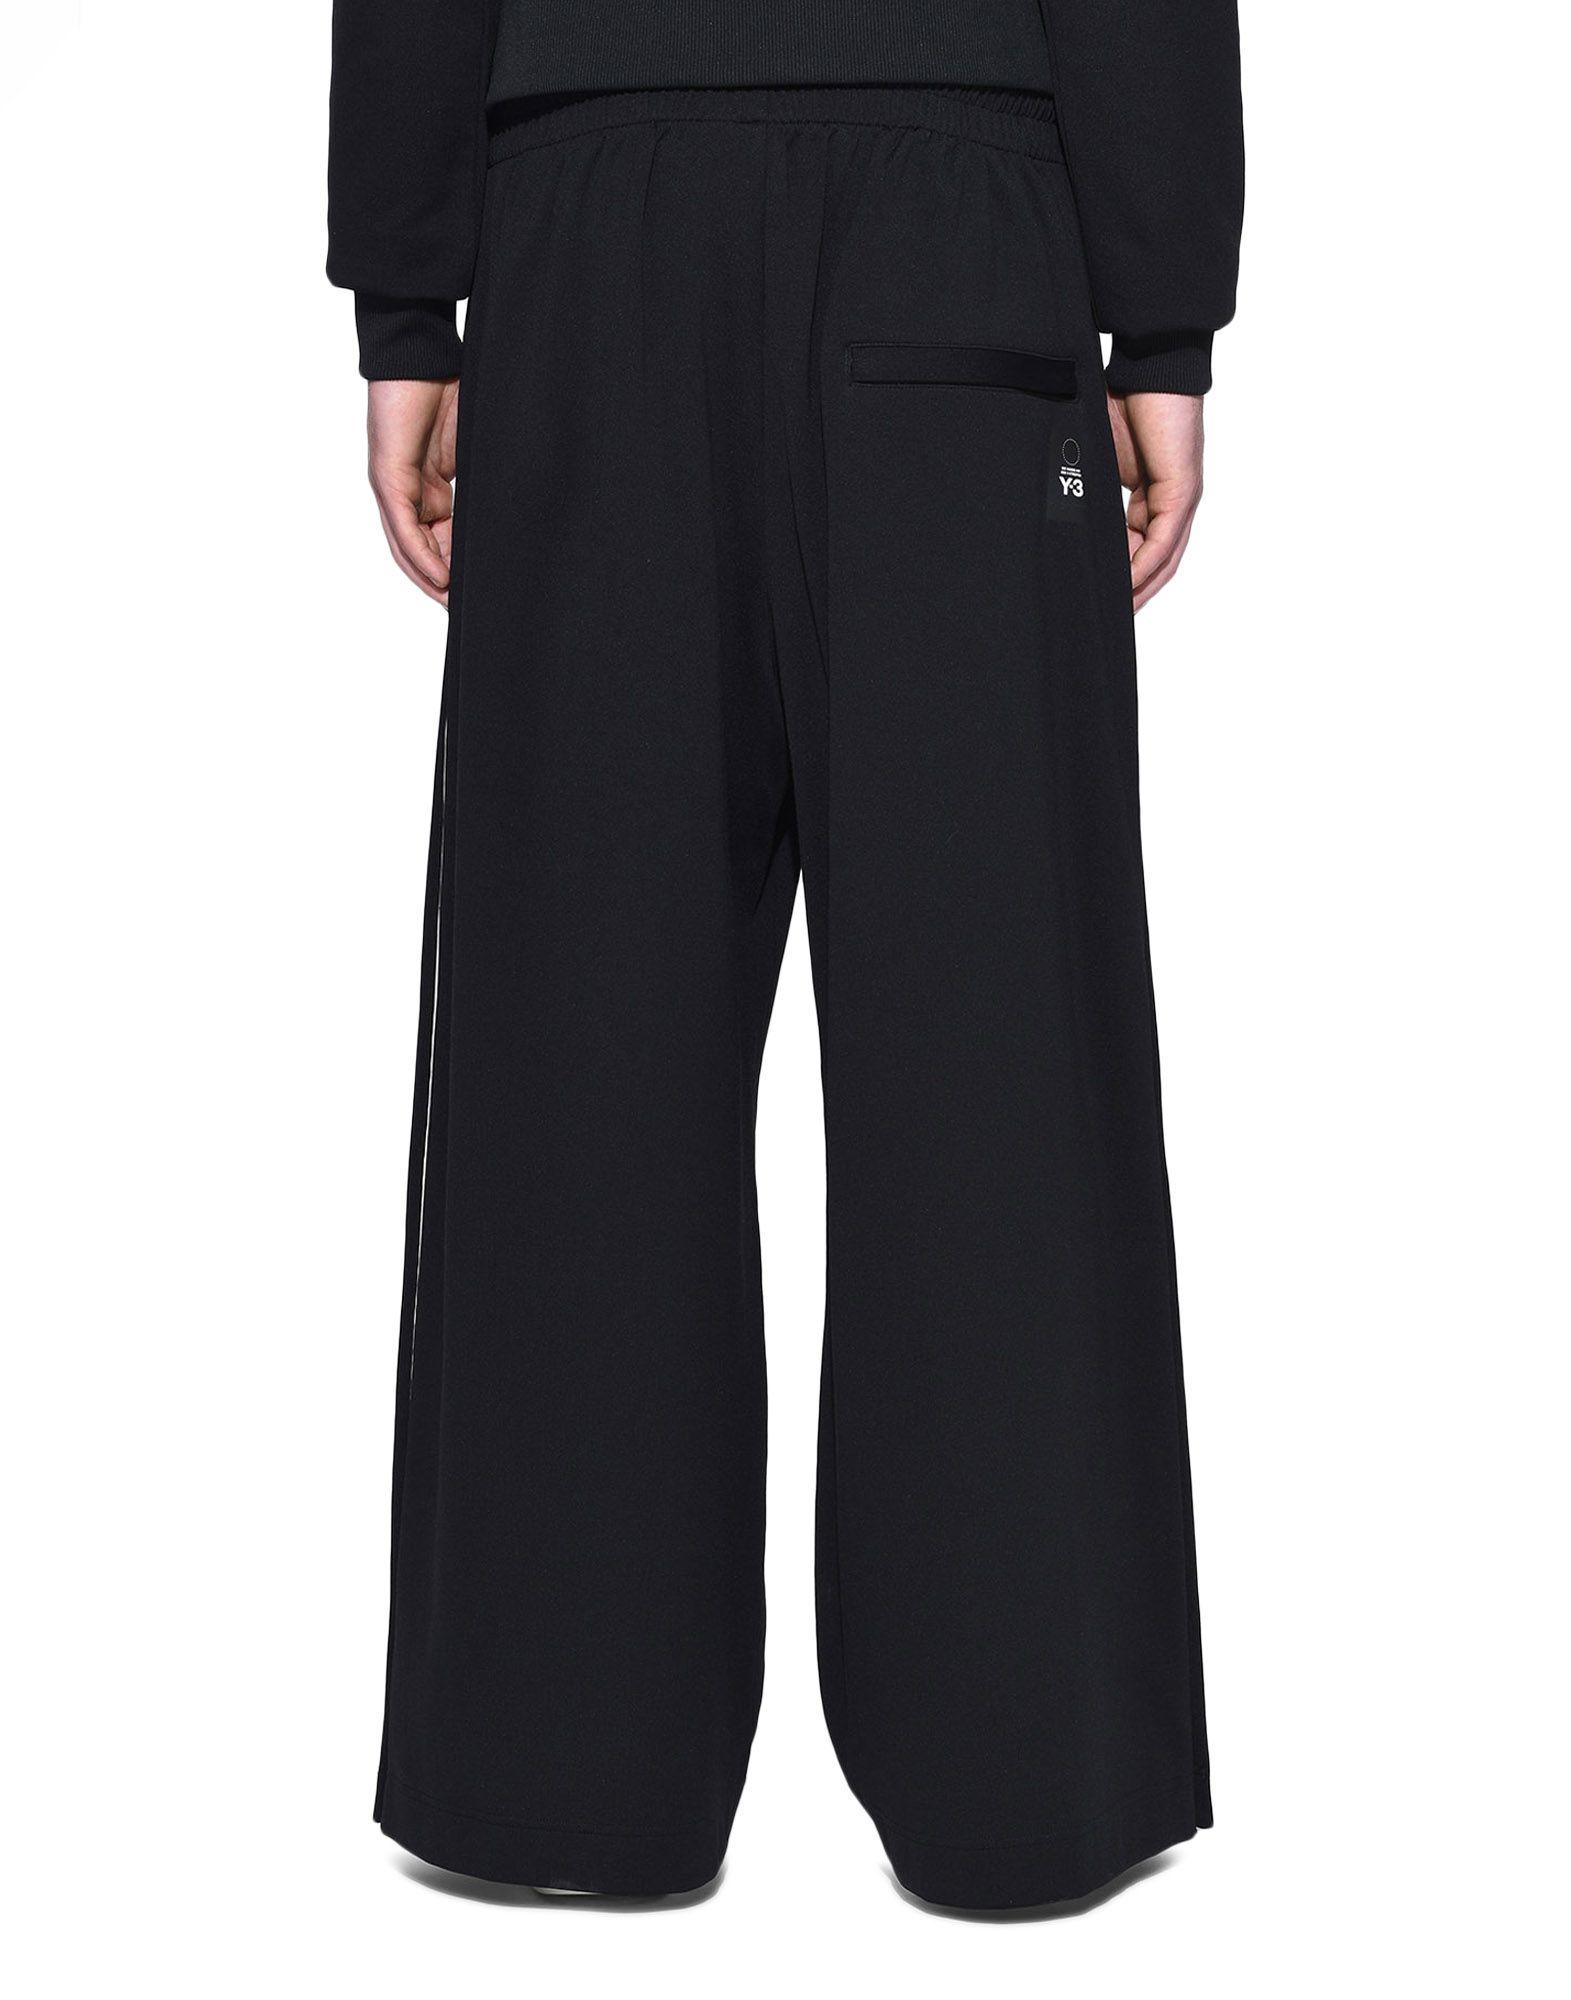 Y-3 Y-3 3-Stripes Matte Snap Track Pants Track pant Man d